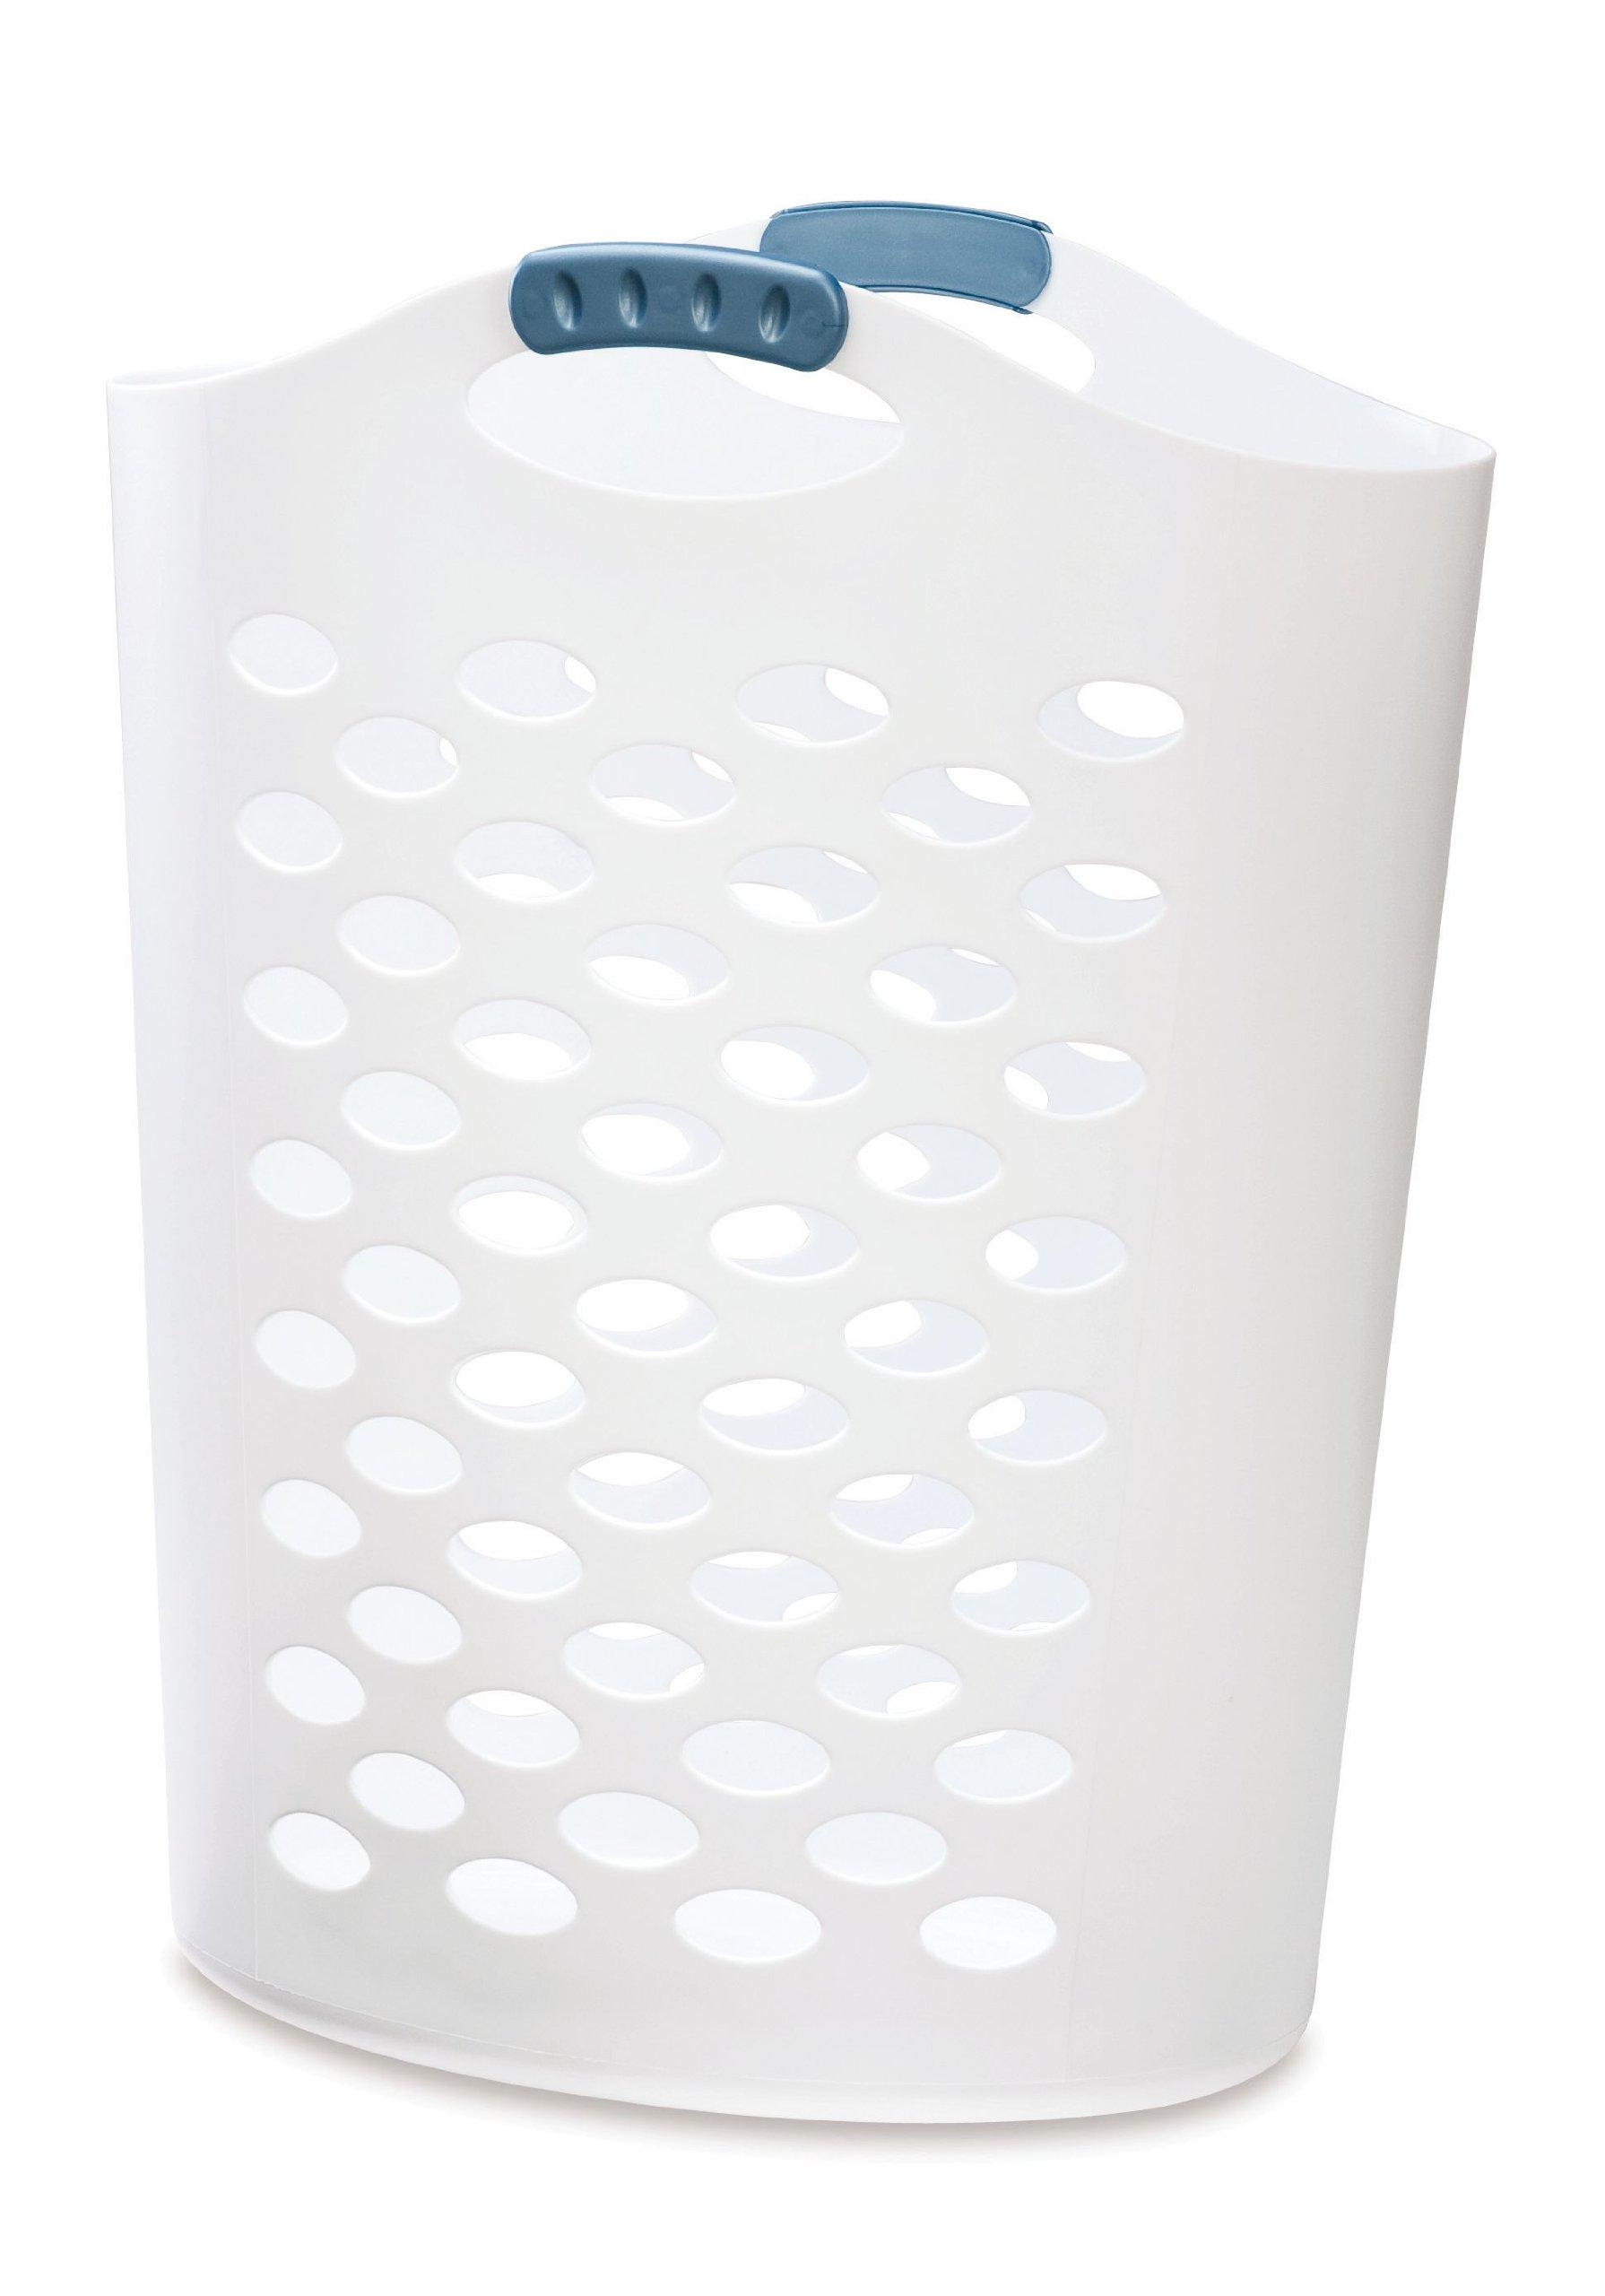 Rubbermaid Flex 'n Carry Laundry Hamper, 2.2-Bushel, White (FG260004WHTRB)